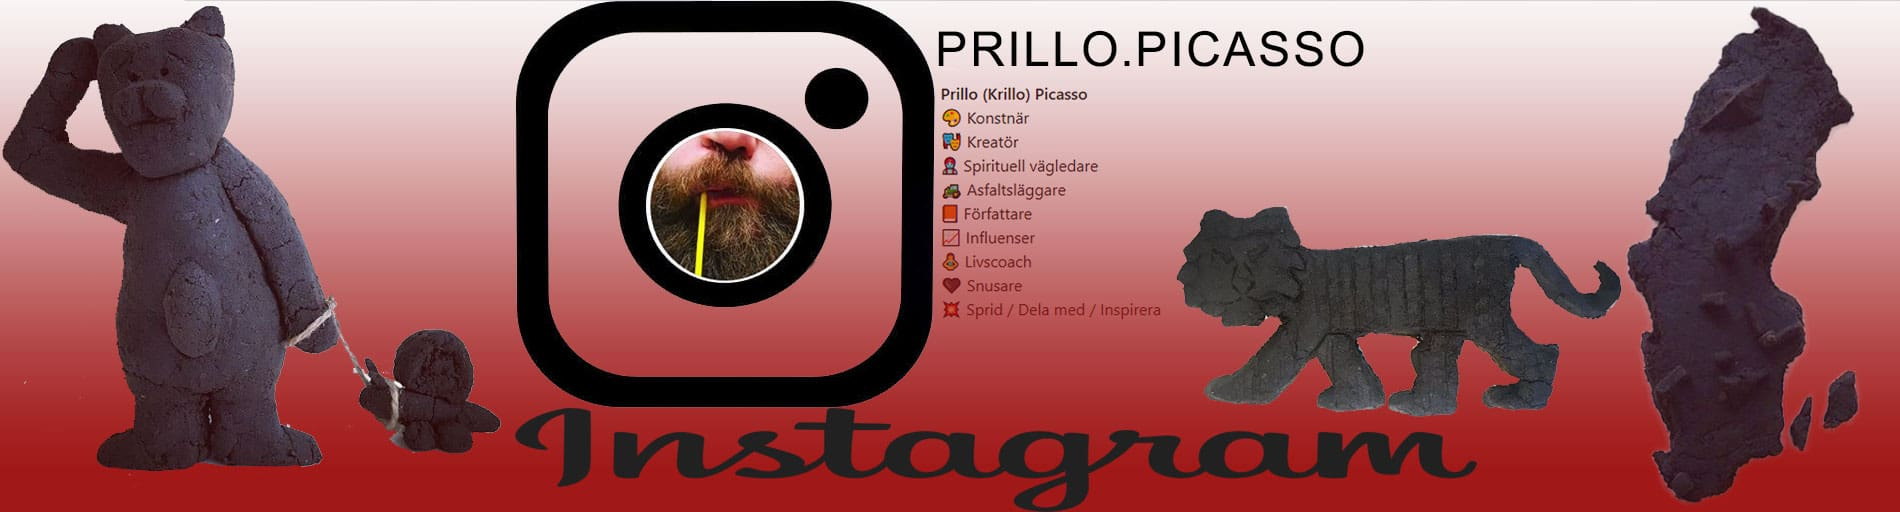 Prillo Picasso på Instagram